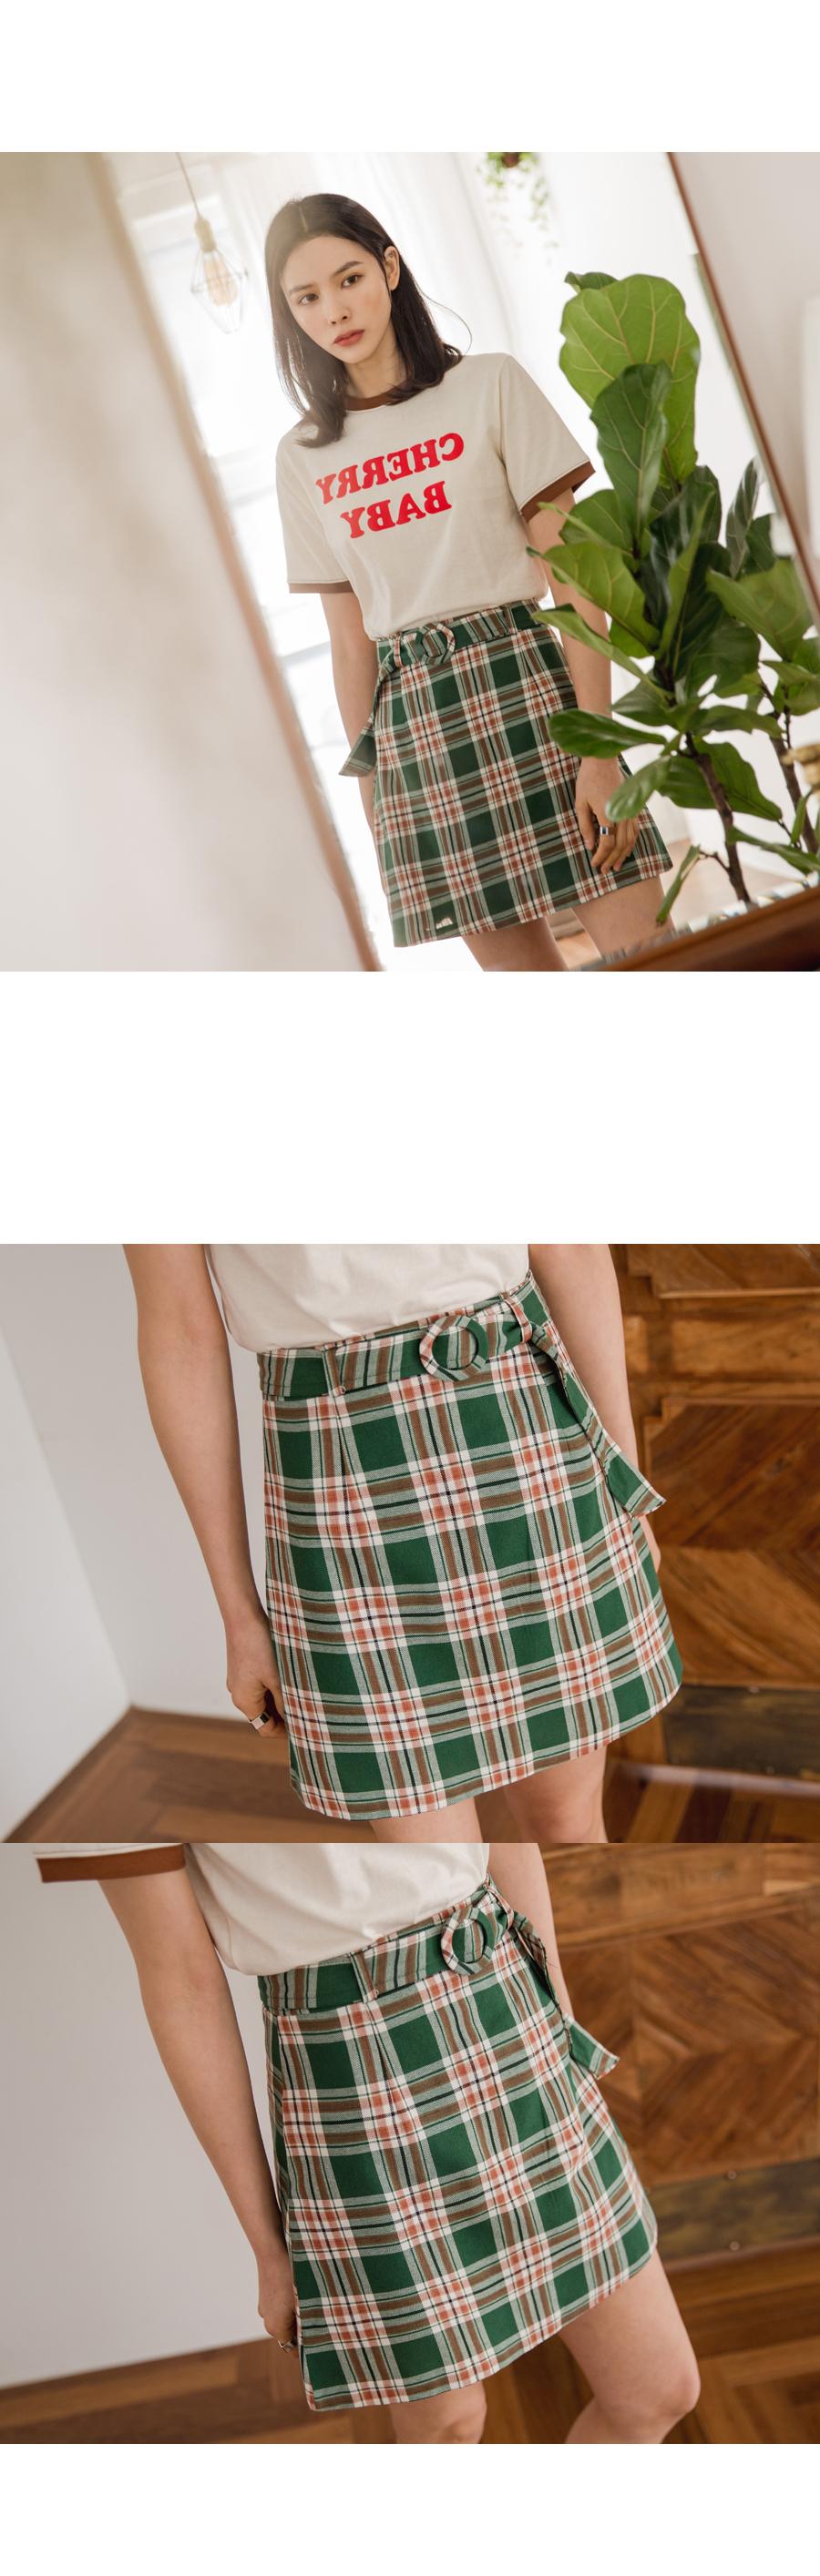 Cherry short-sleeved tee